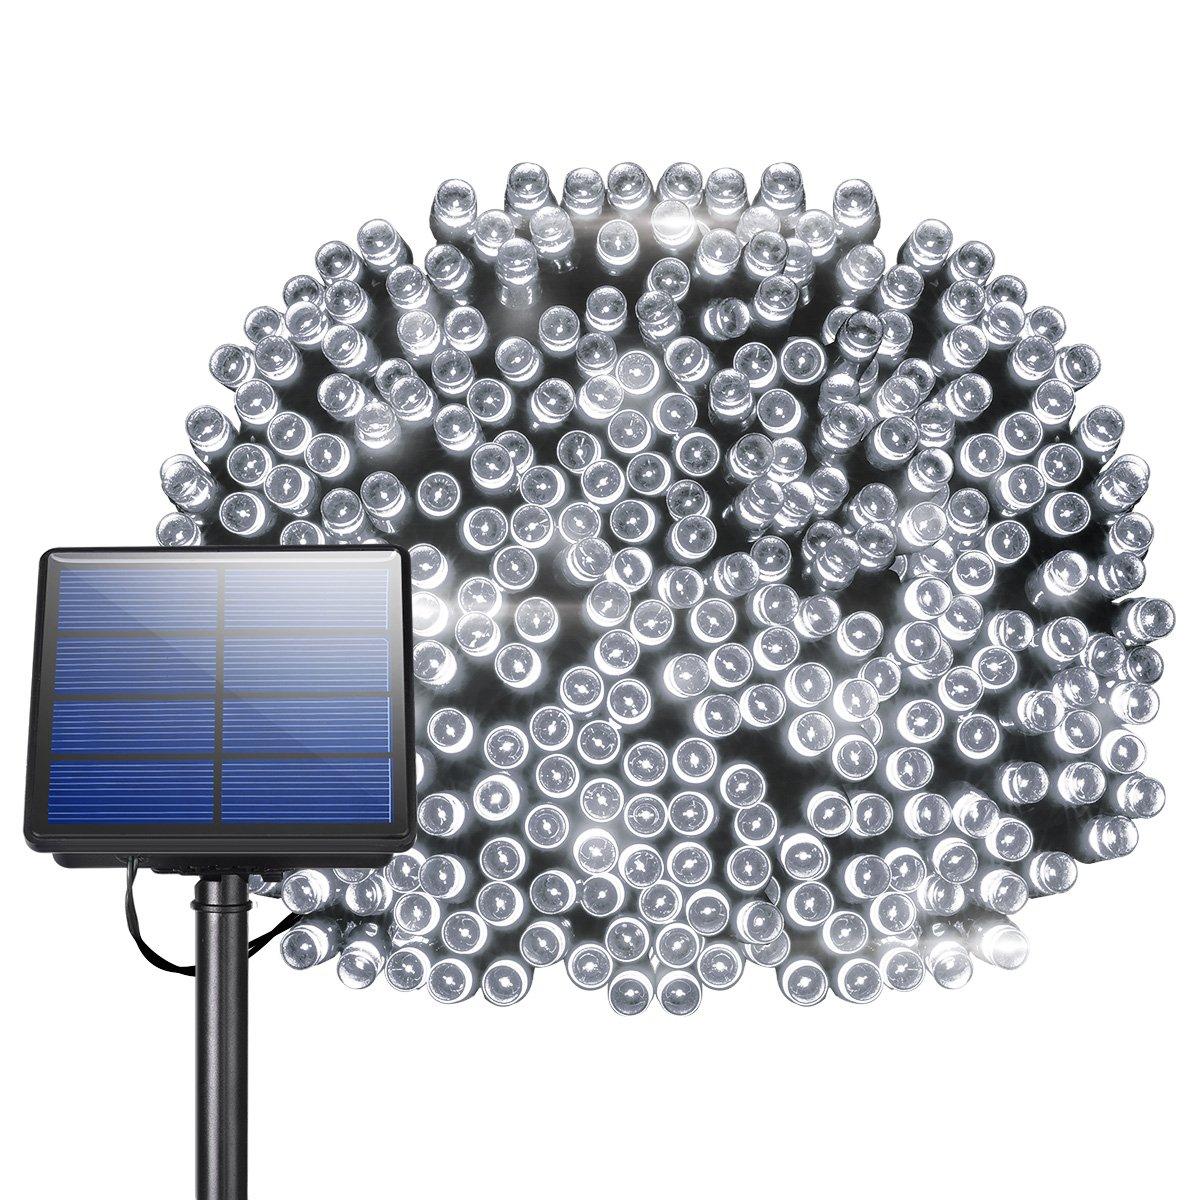 Litom 200 LED Solar String Lights